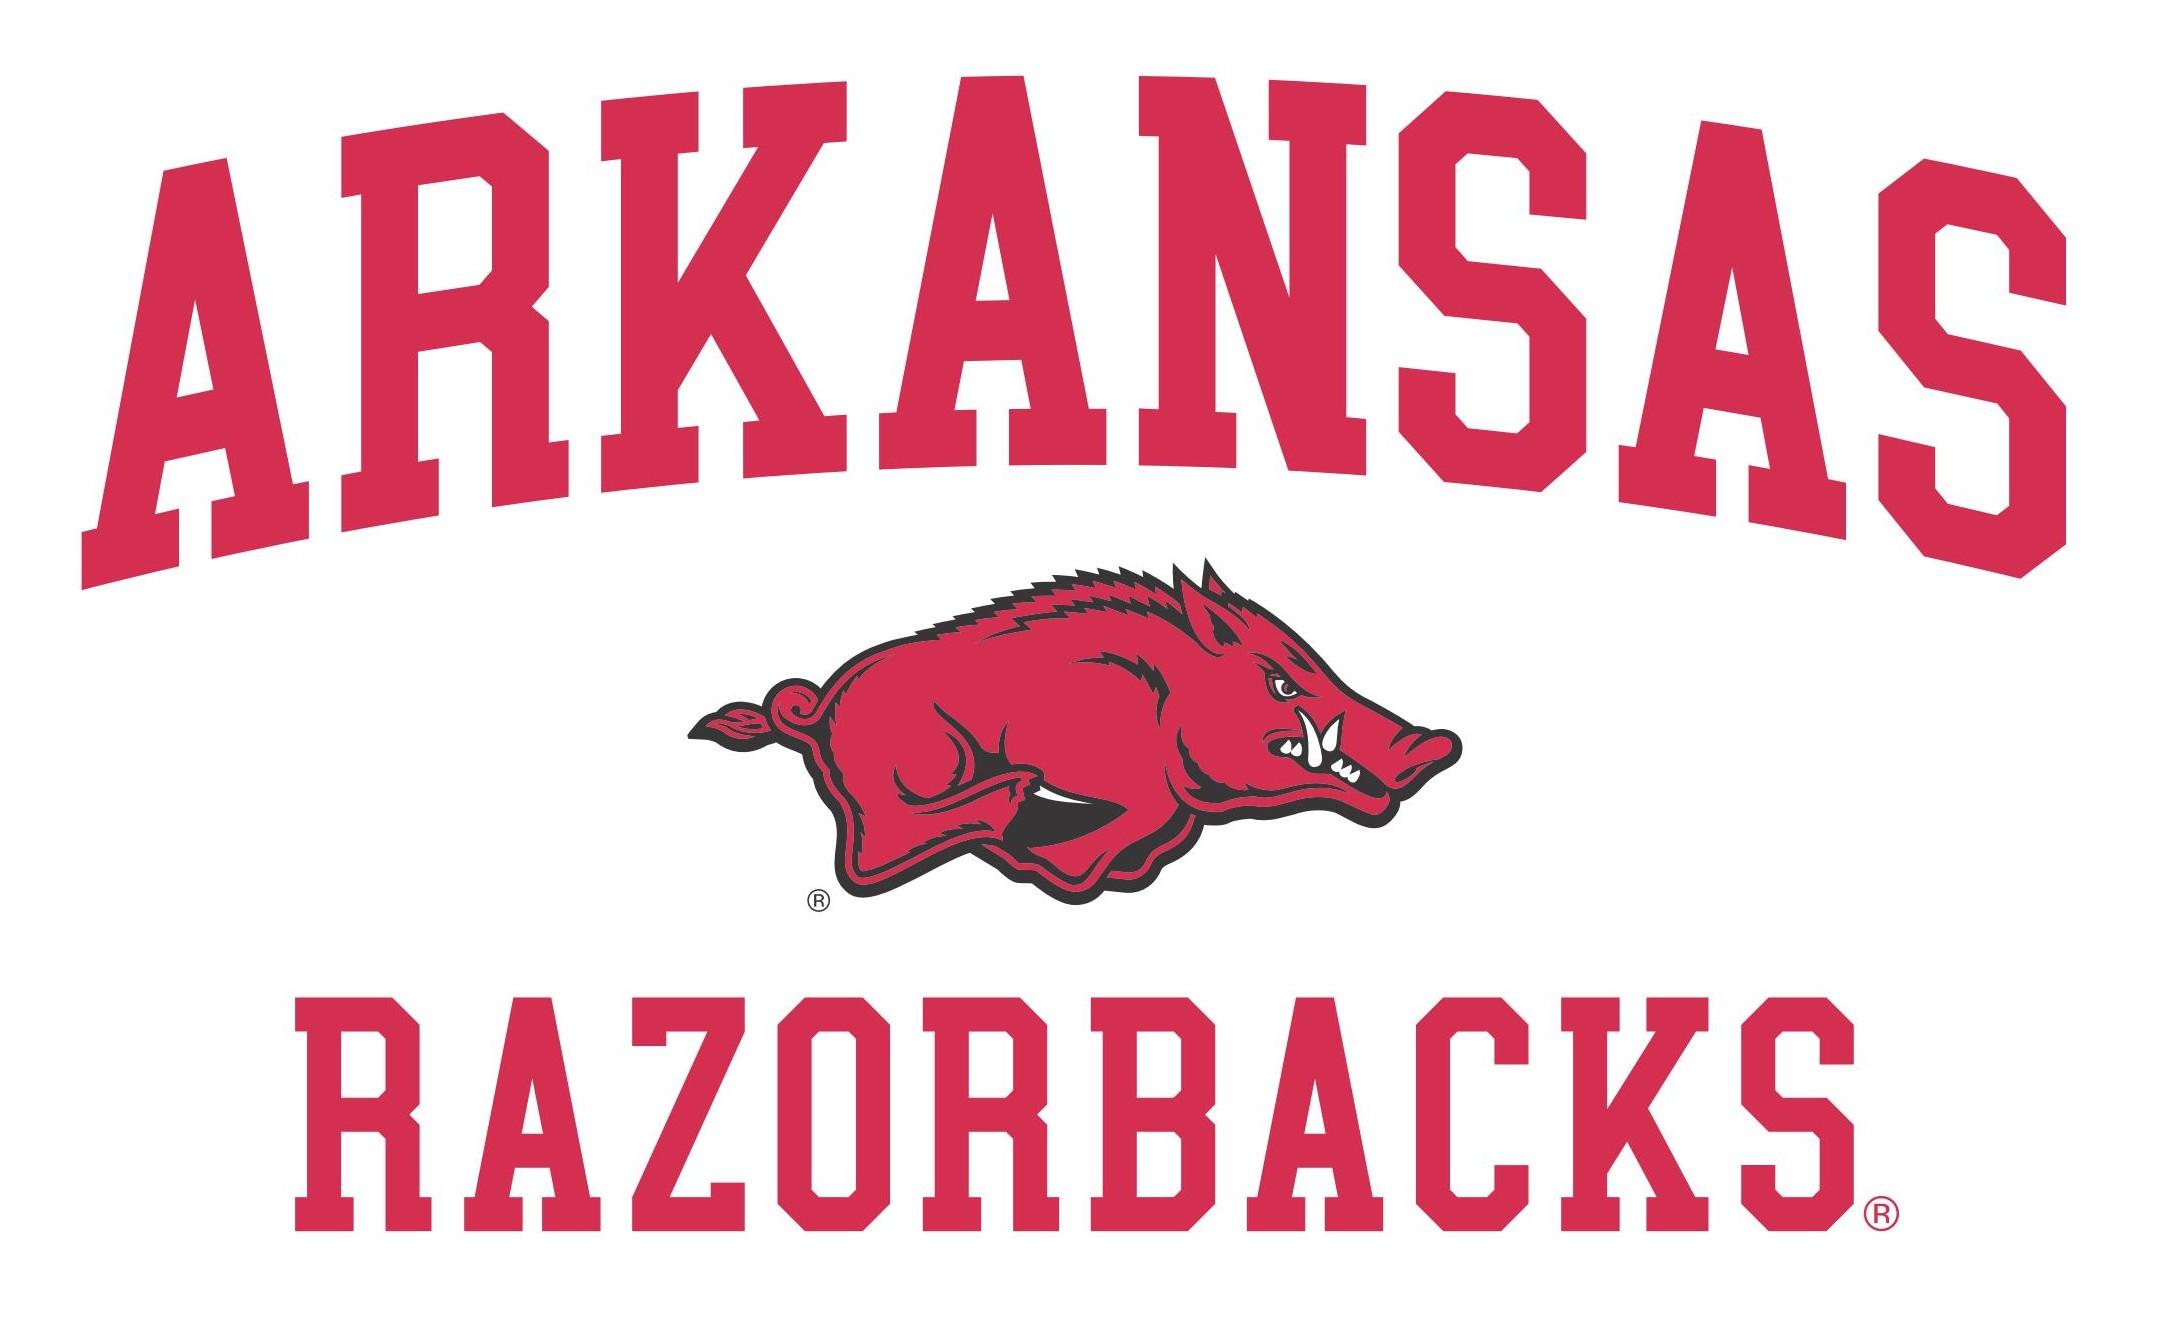 Arkansas Razorbacks Tickets